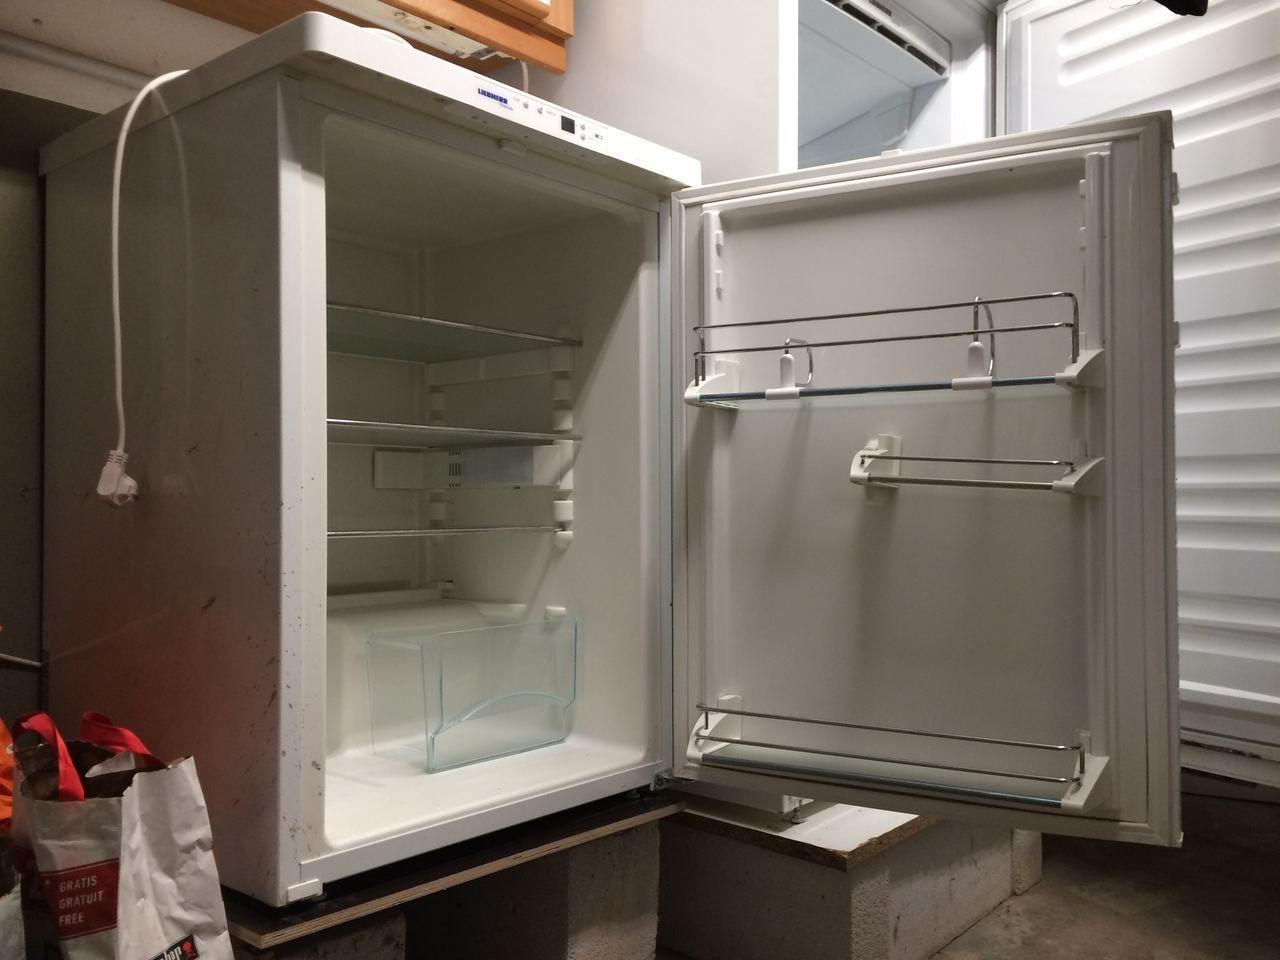 Kühlschrank Reinigen : Kühlschrank reinigen tipps und hausmittel utopia